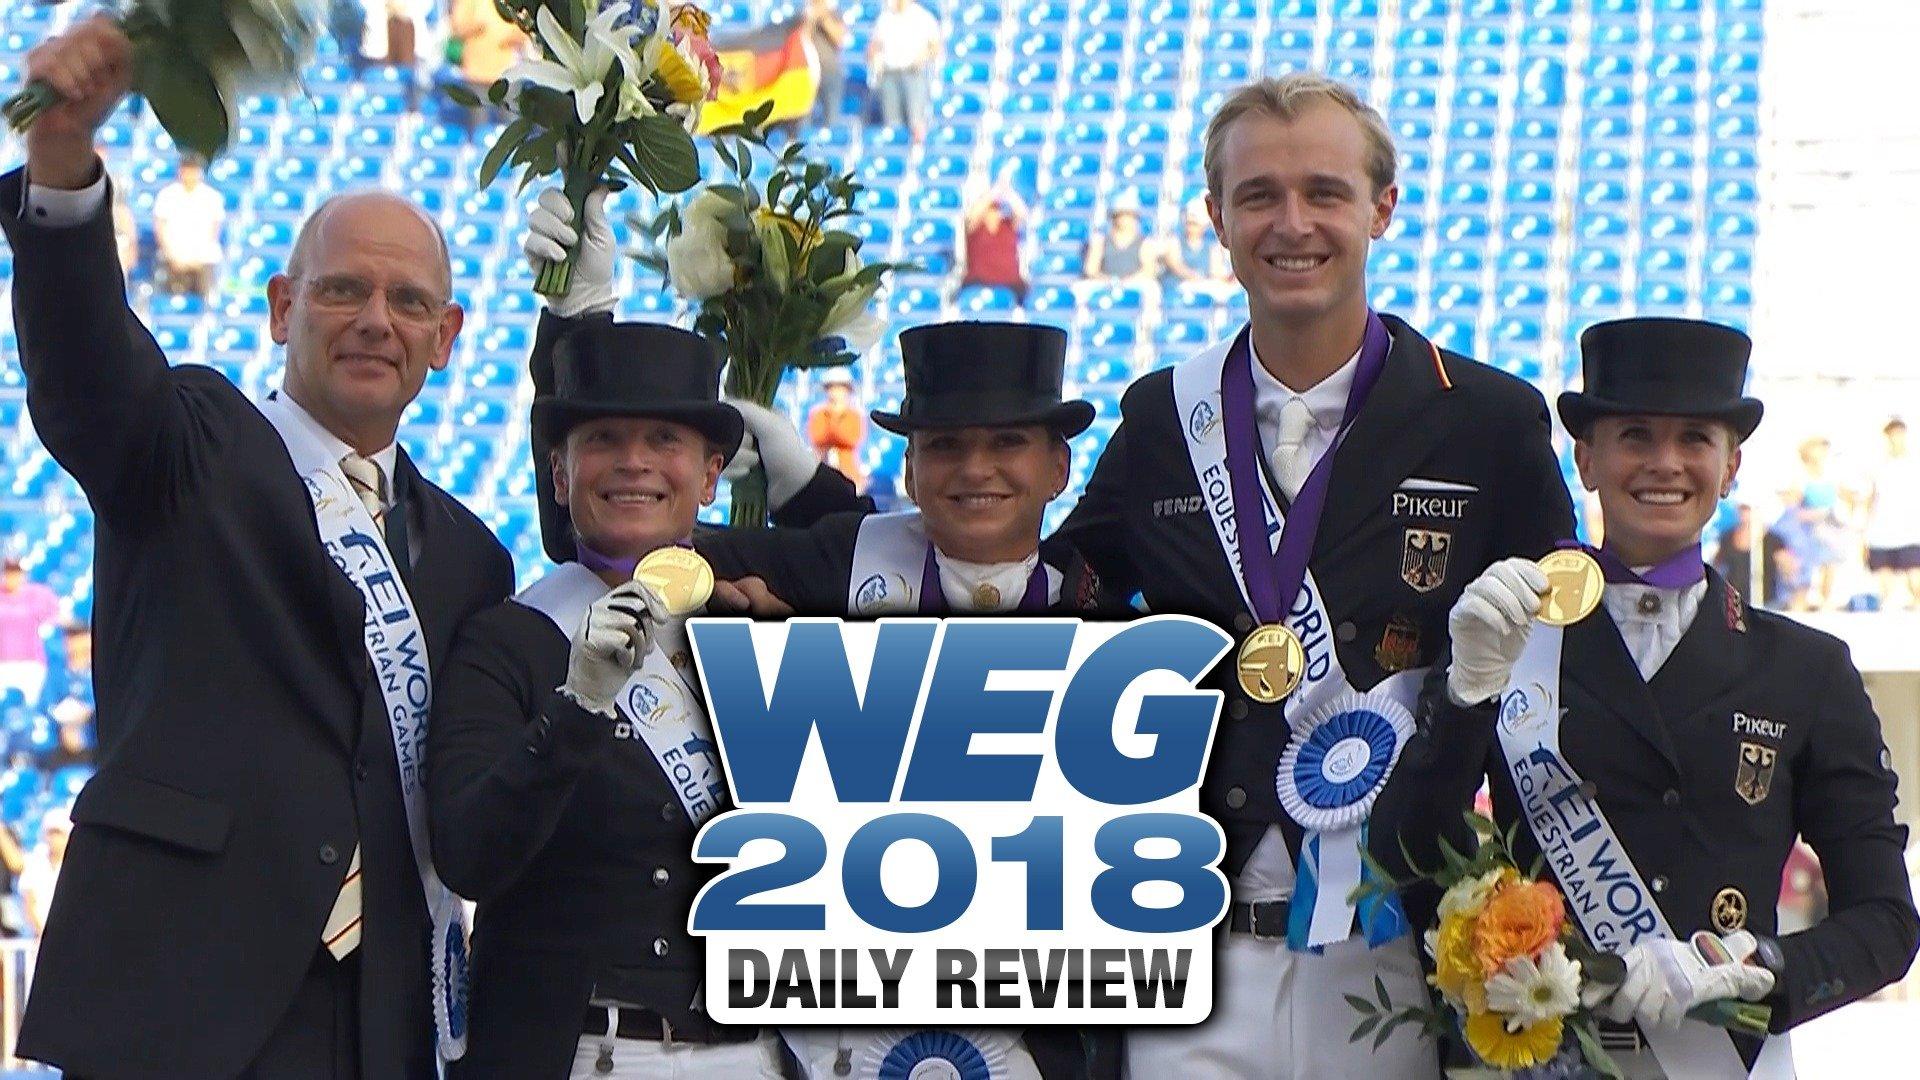 WEG 2018: Daily Review